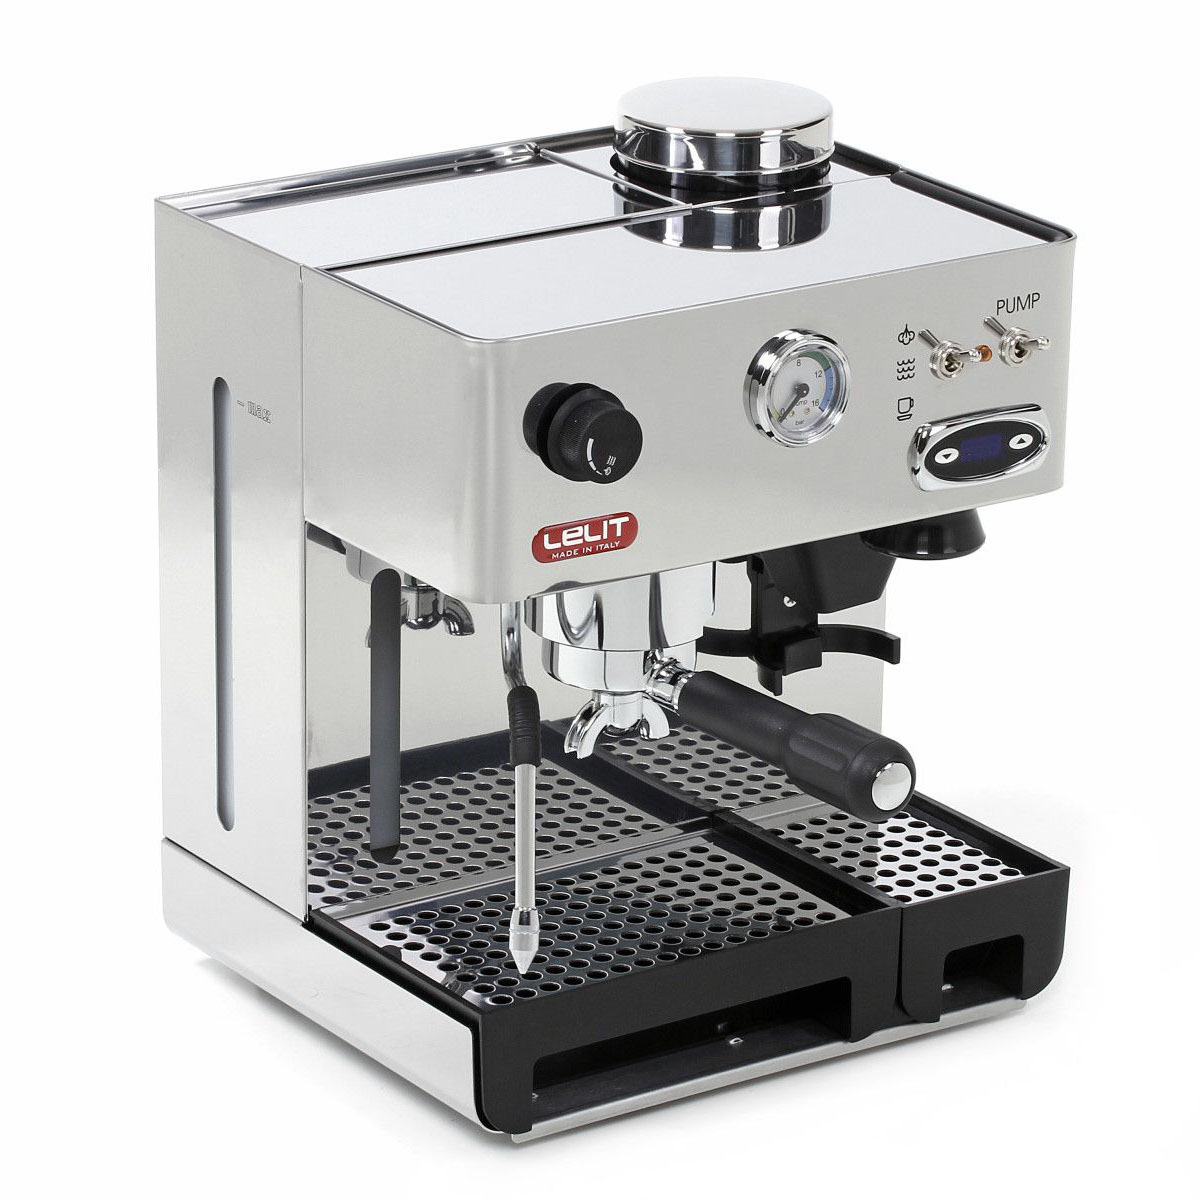 Espressor manual Lelit PL 42 TEMD, 1000 W, 2.7 L, 15 bar, rasnita, manometru, PID